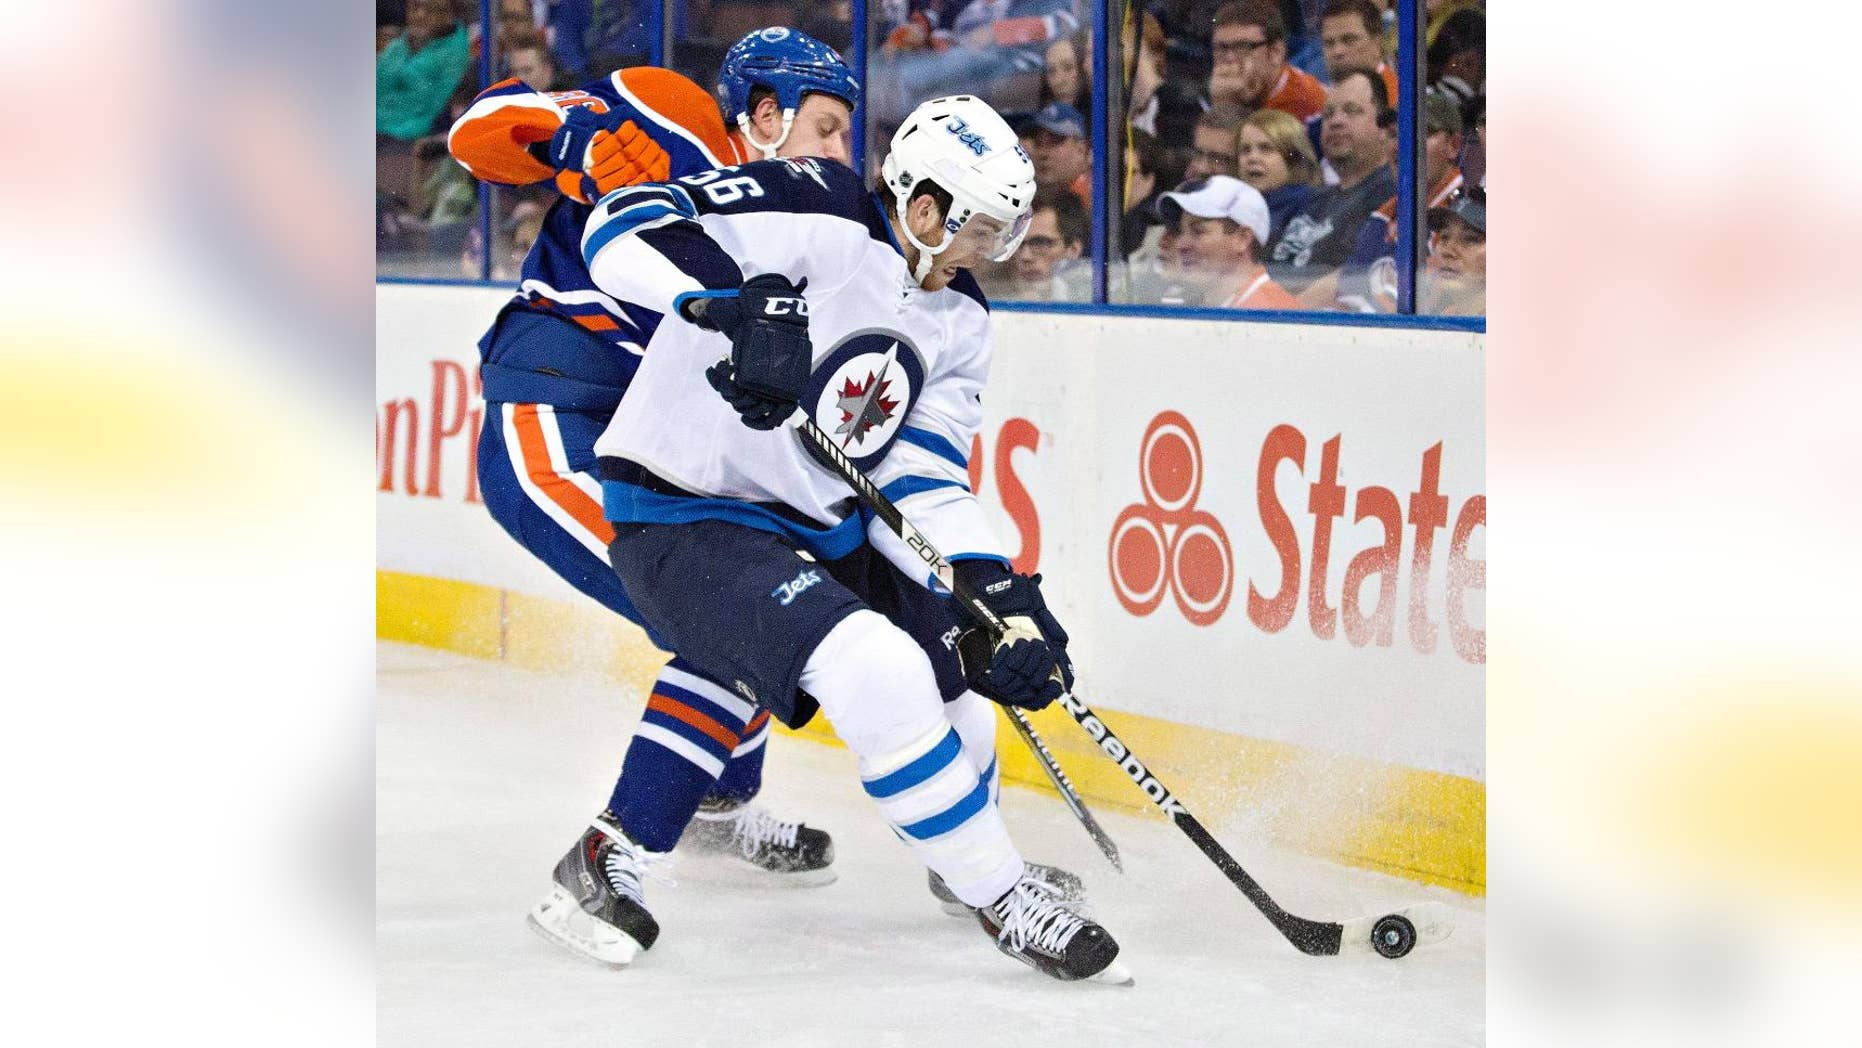 Edmonton Oilers goalie Viktor Fasth (35) and Mark Fayne (5) celebrate a win over the Winnipeg Jets during an NHL hockey game in Edmonton, Alberta, on Monday, Sept. 29, 2014. (AP Photo/The Canadian Press, Jason Franson)